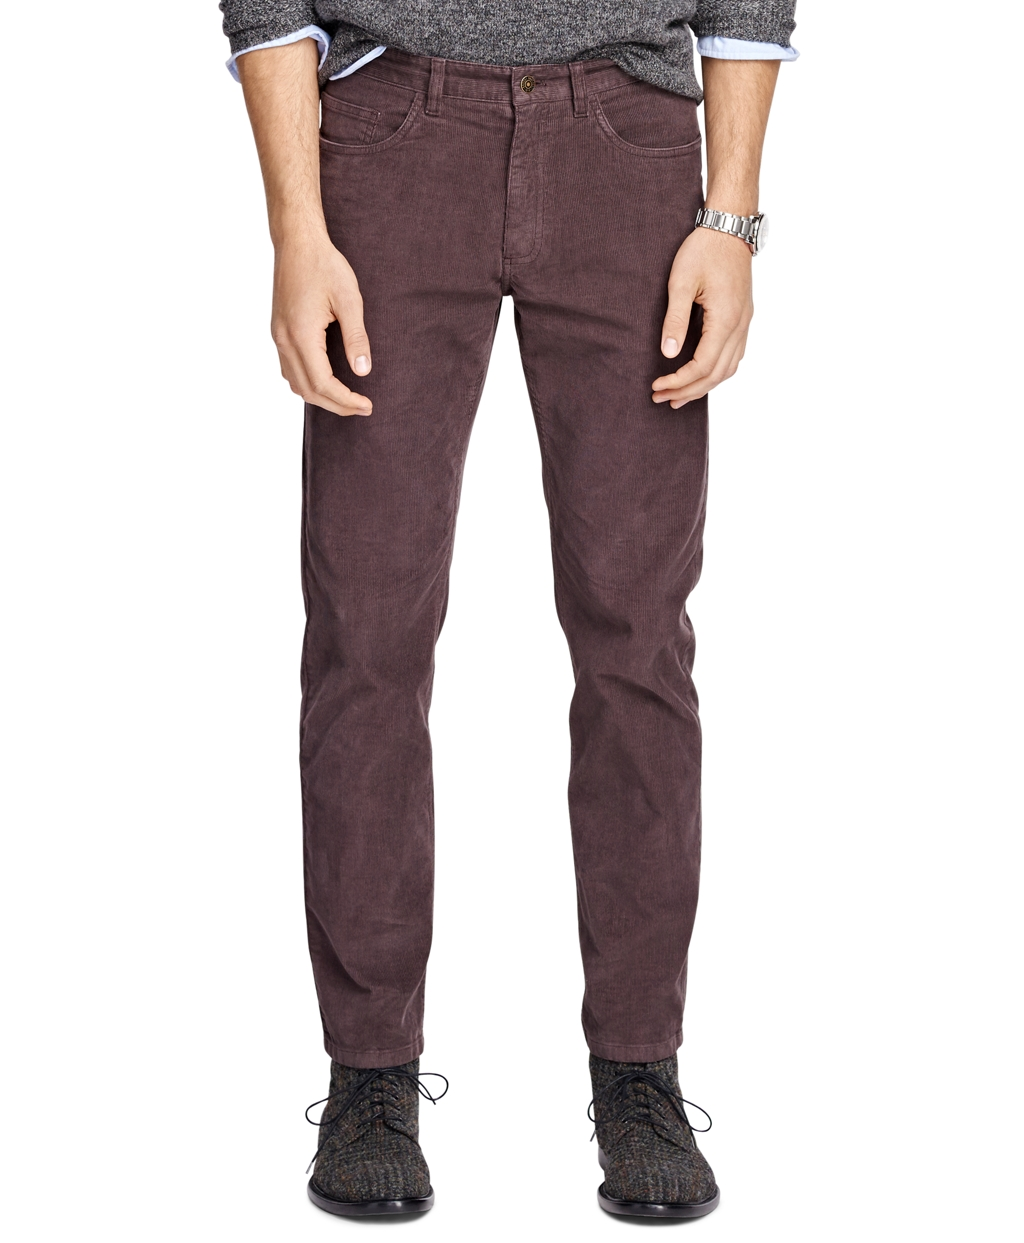 Colorful Dress Pants For Men